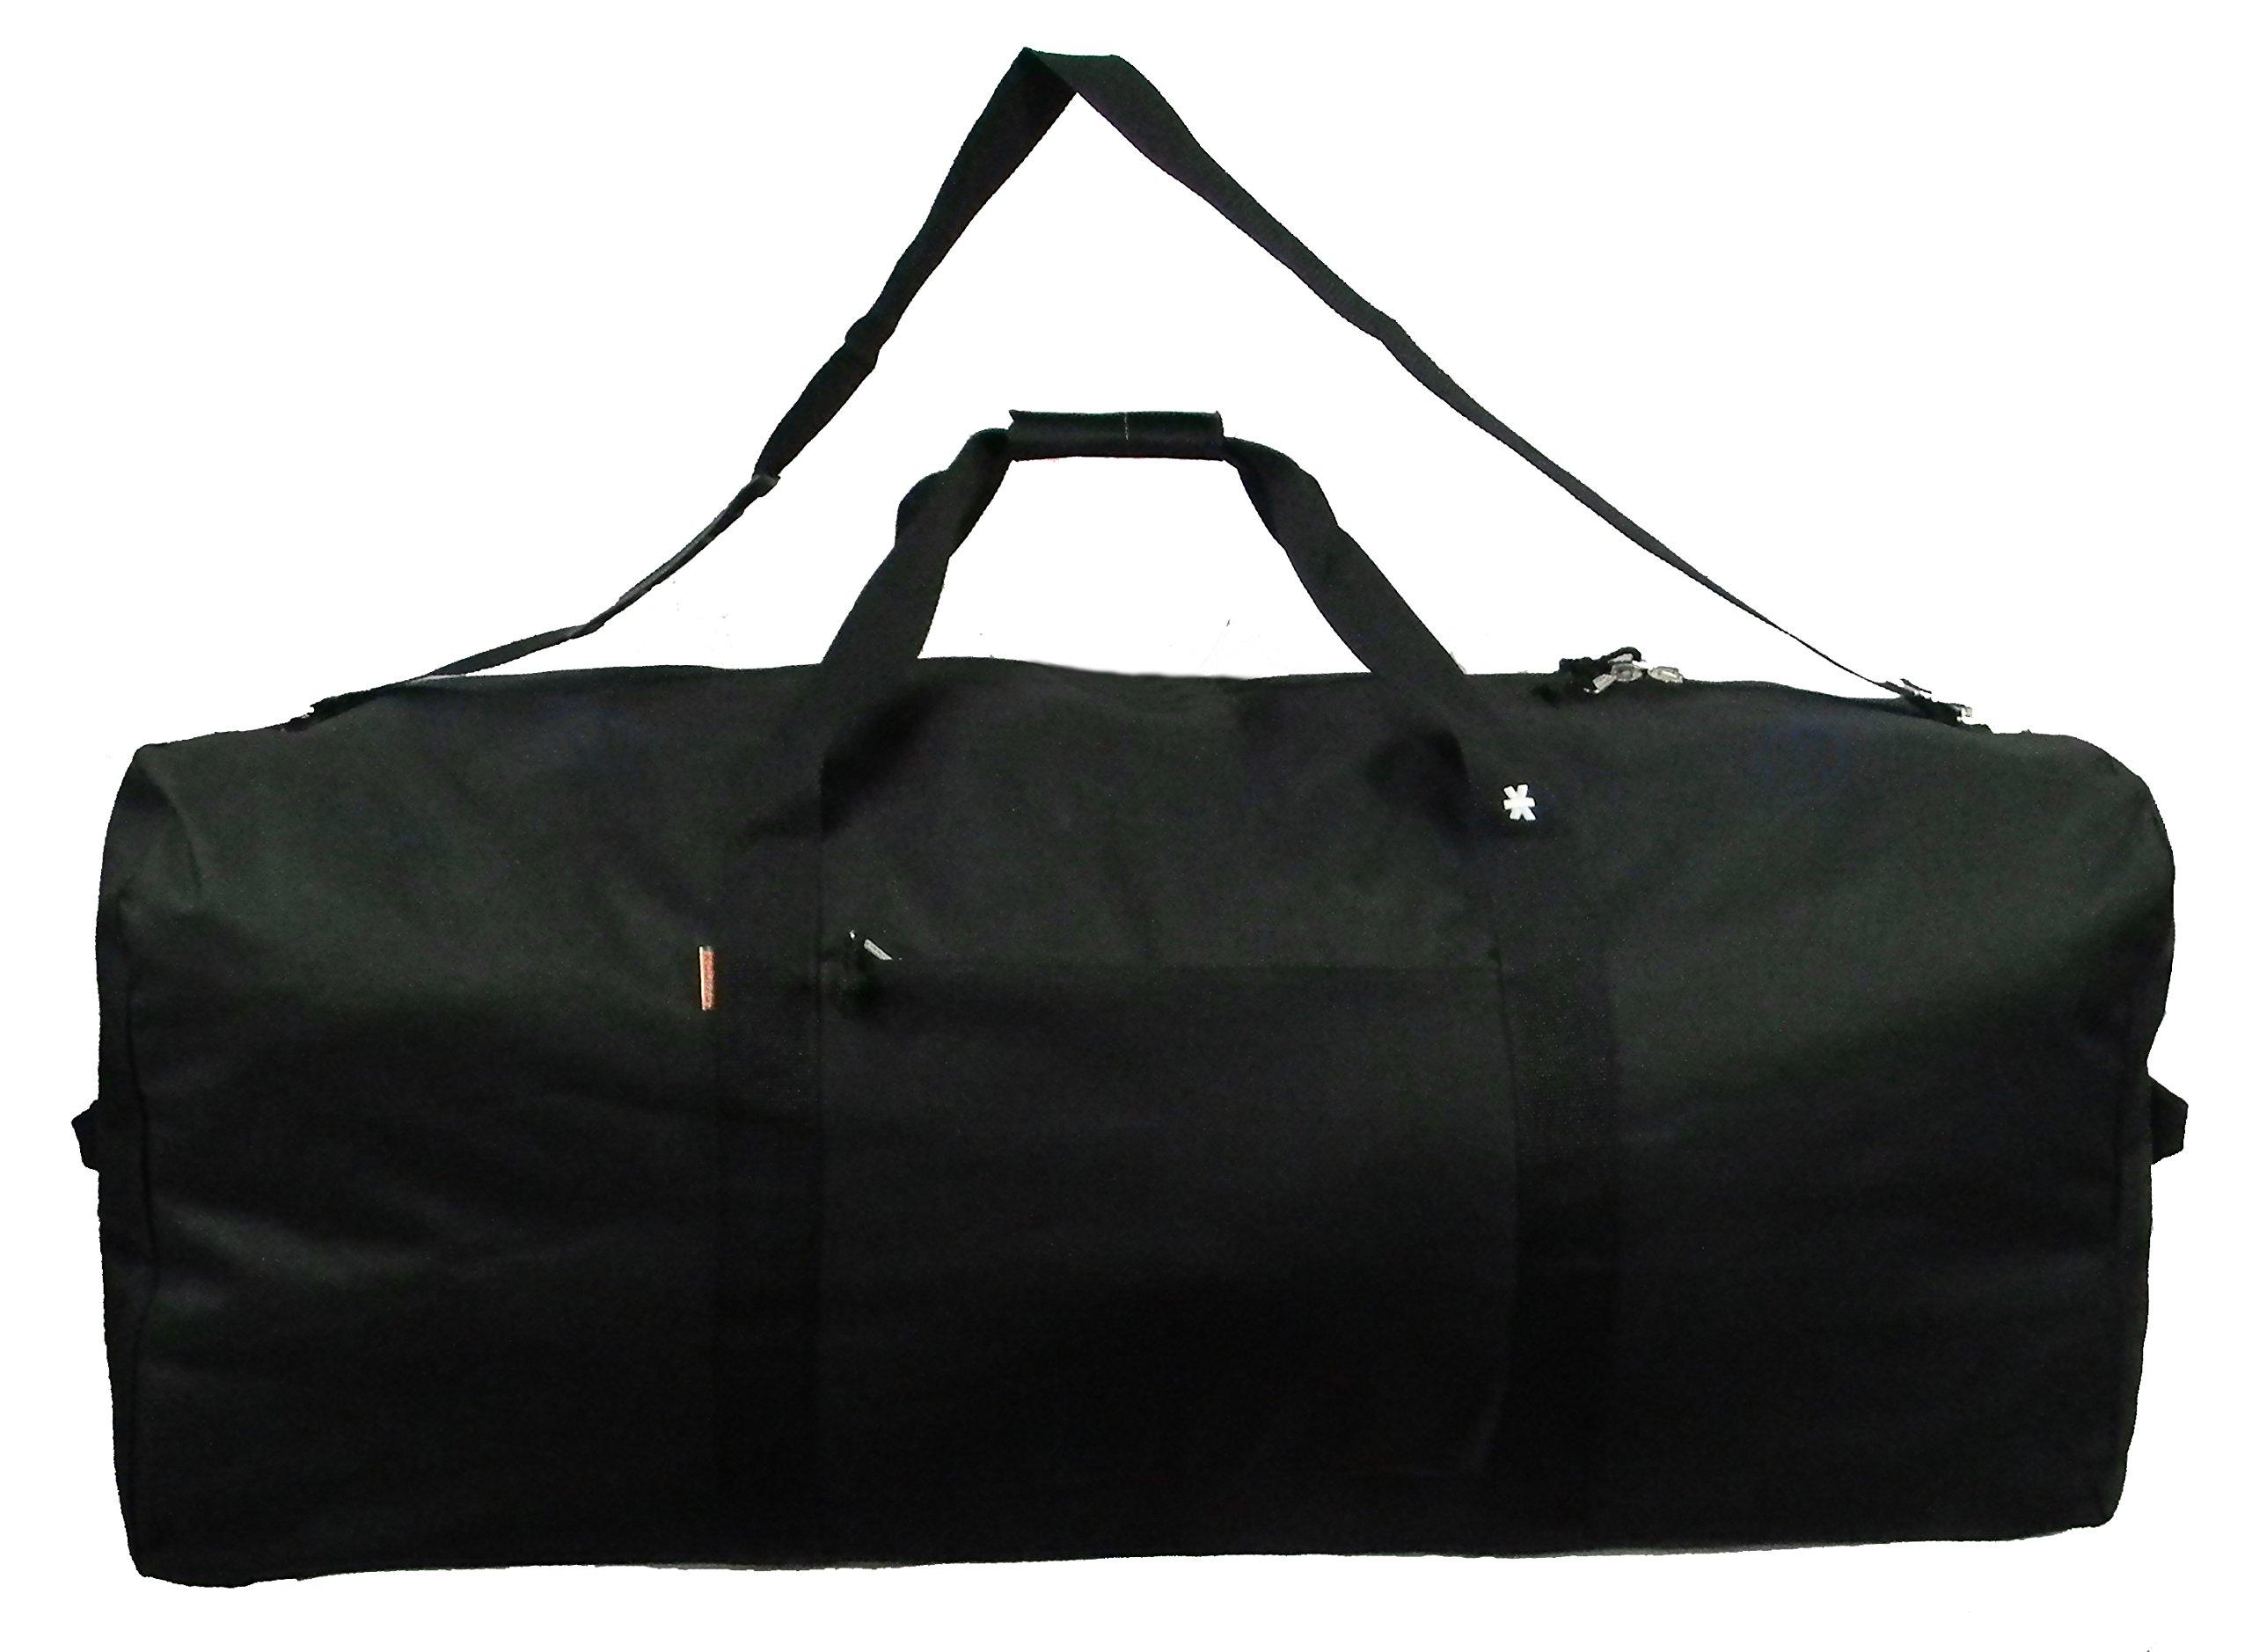 Heavy Duty Cargo Duffel Large Sport Gear Drum Set Equipment Hardware Travel Bag Rooftop Rack Bag 36 Inch Black Medium Traveling Bags by iHIM (Image #1)